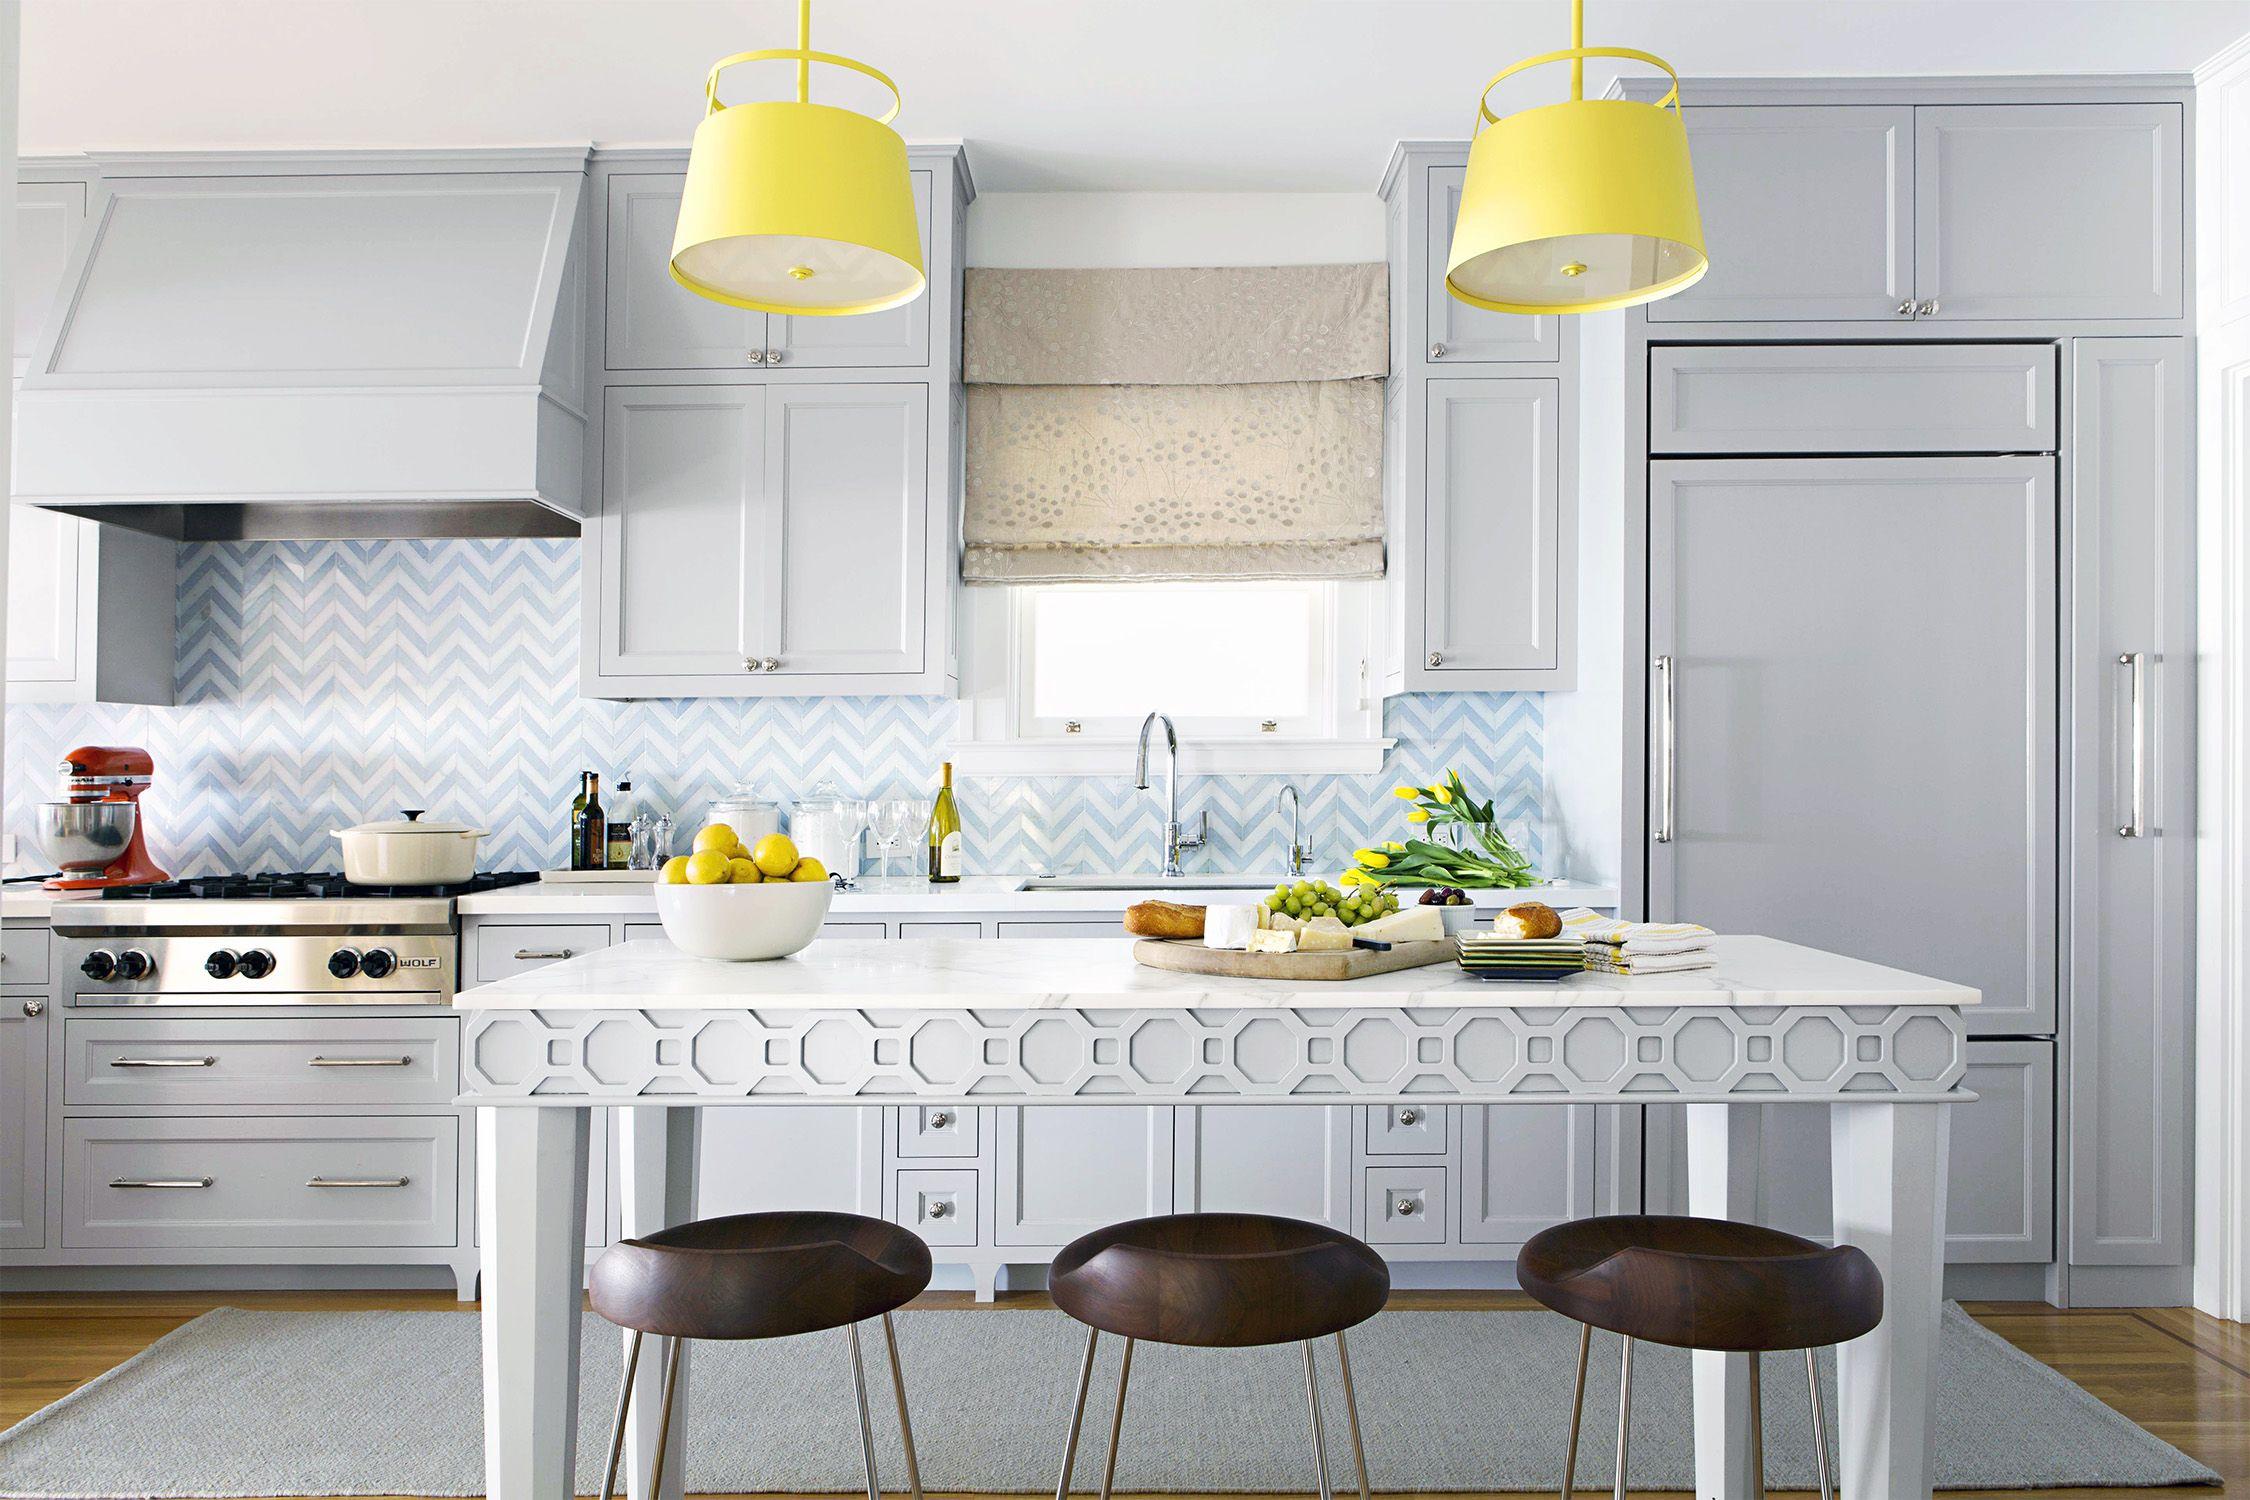 9 Best Kitchen Ideas - Decor and Decorating Ideas for Kitchen Design